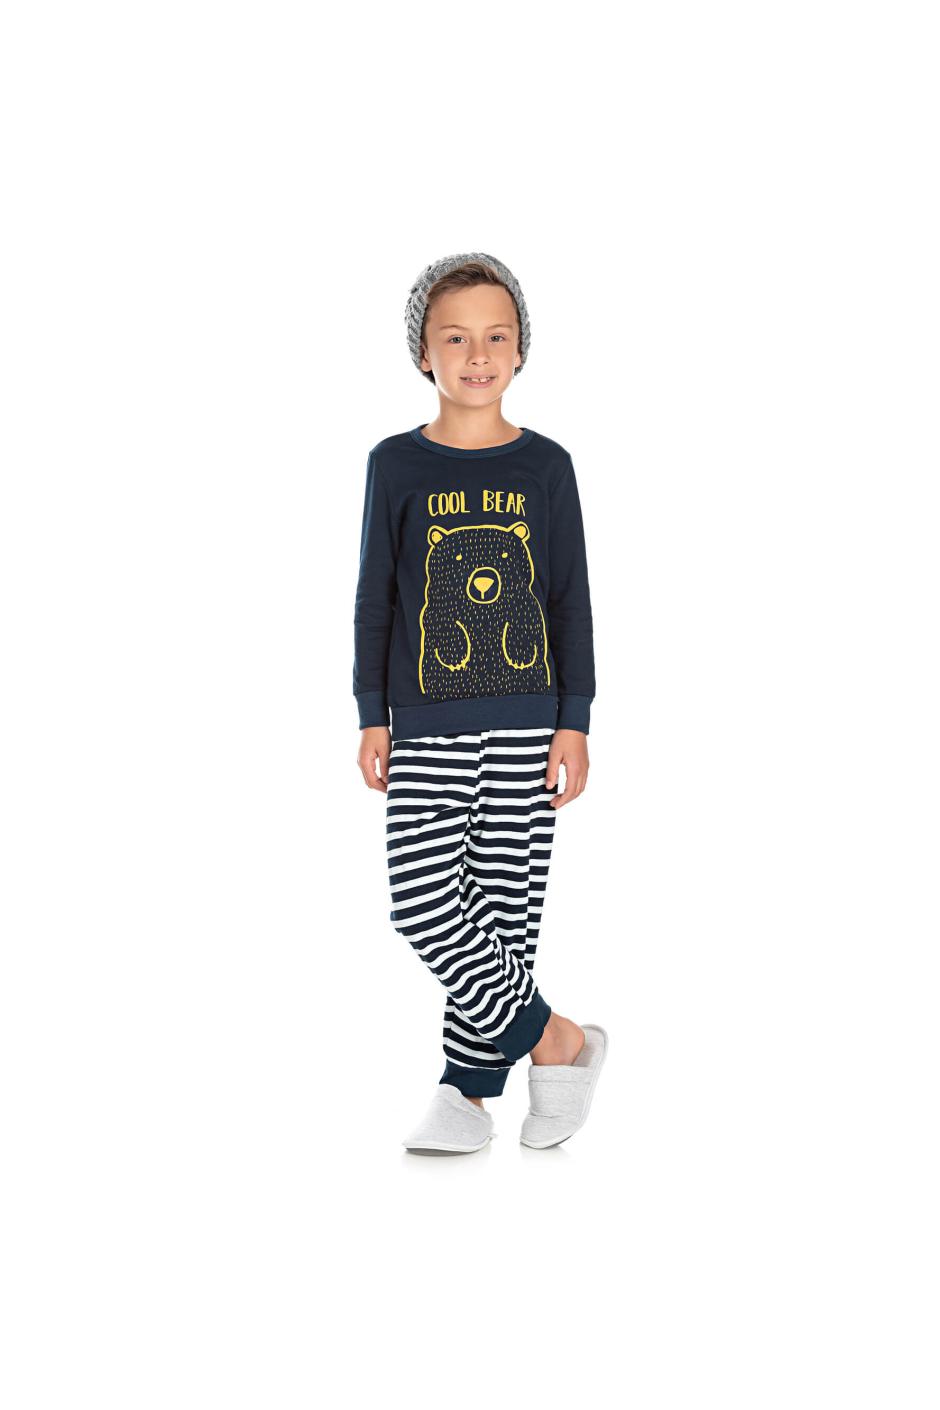 041/D - Pijama Infantil Masculino Cool Bear